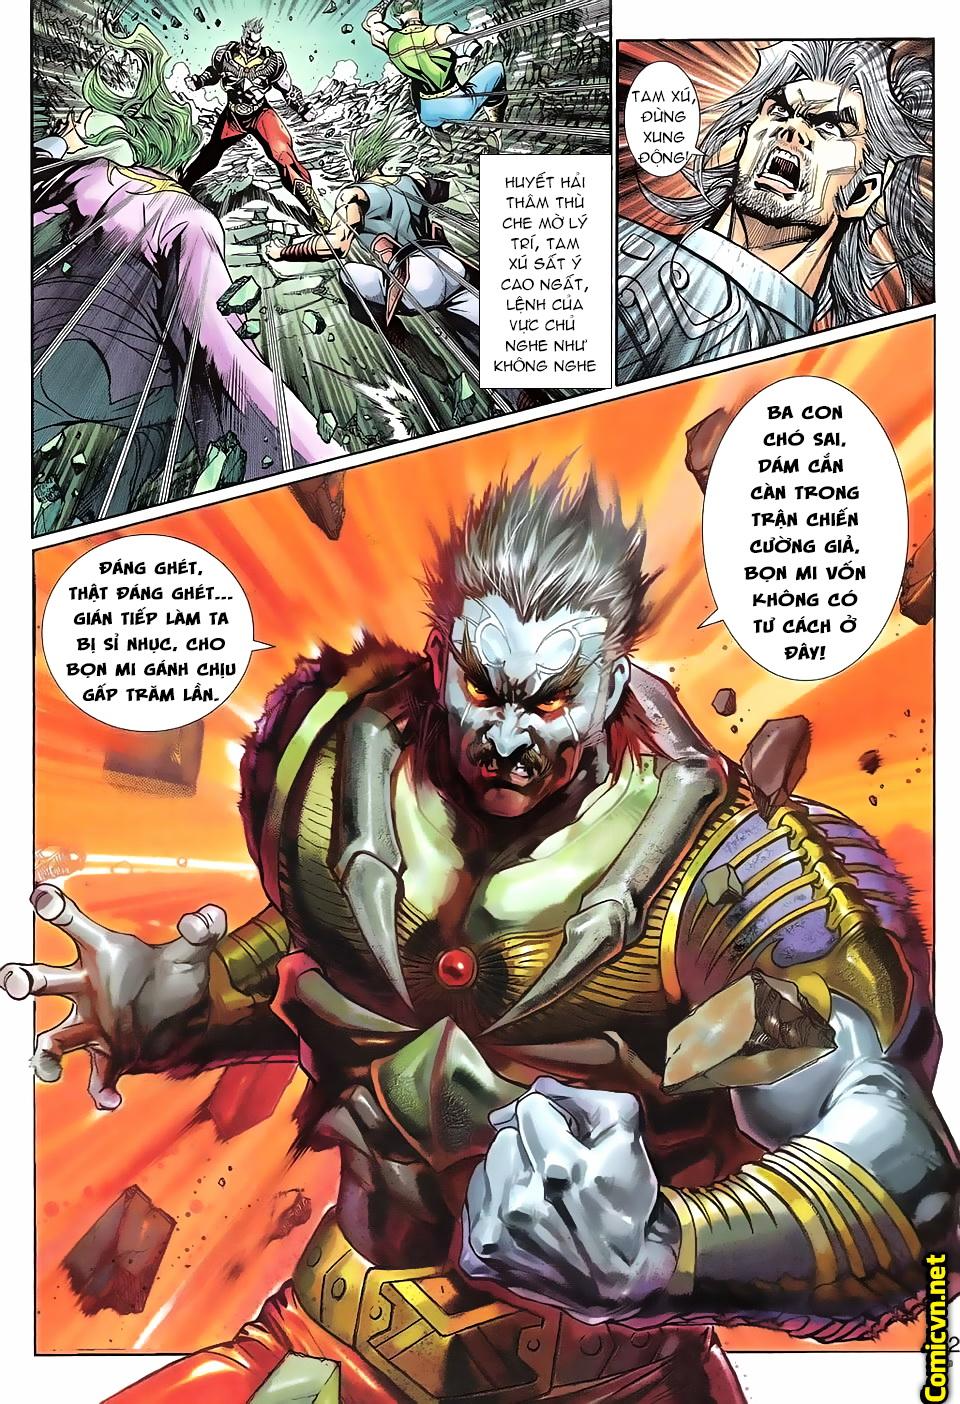 Thần binh huyền kỳ 3 - 3.5 Chapter 90 - Hamtruyen.vn